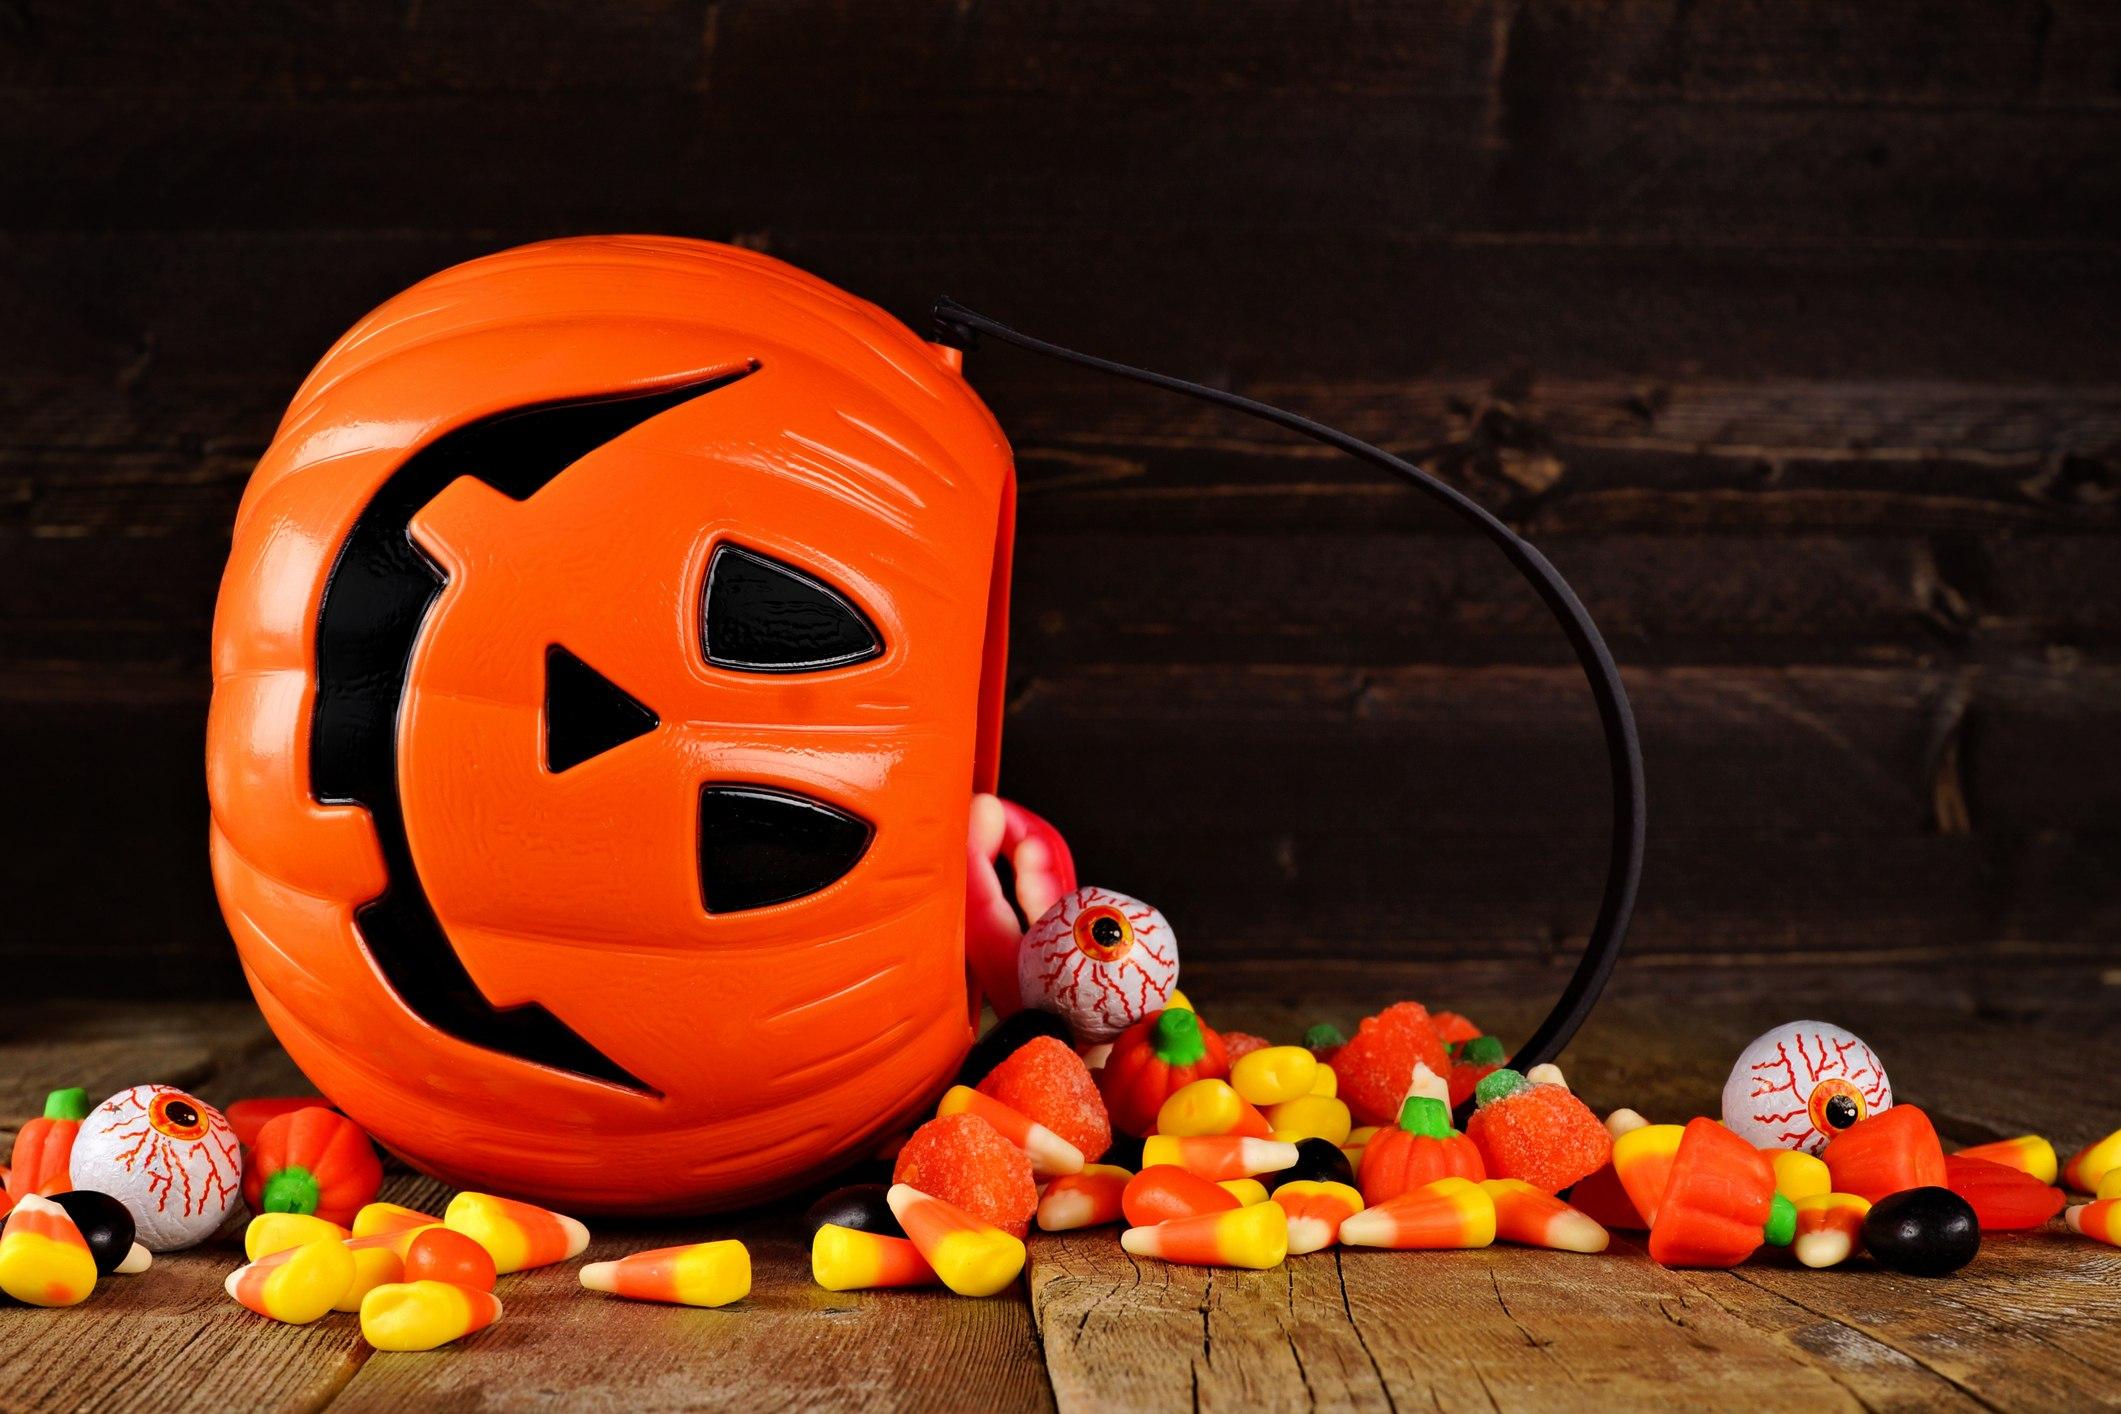 Candy spilling Halloween